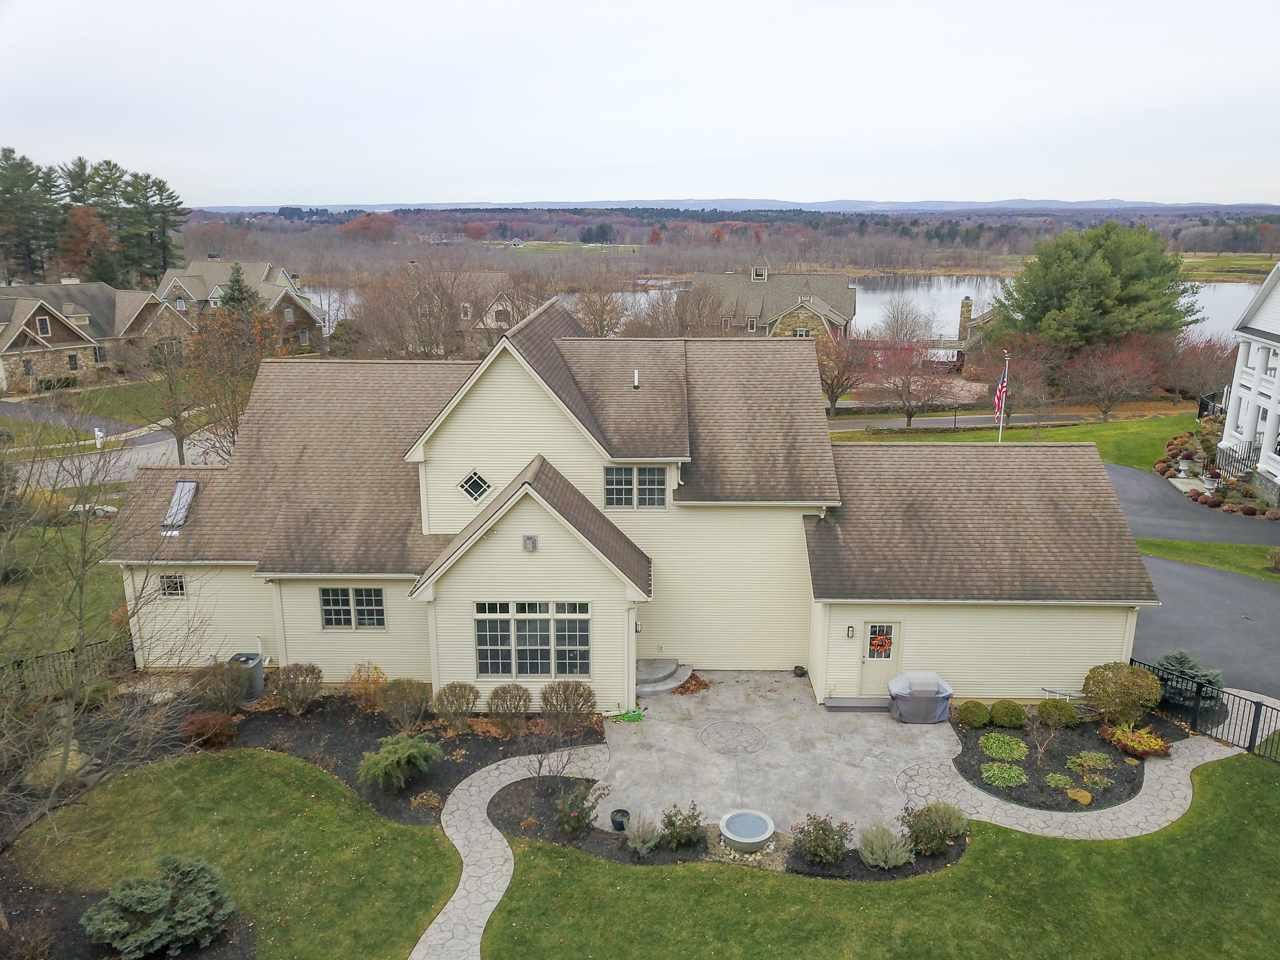 Saratoga Springs image 52